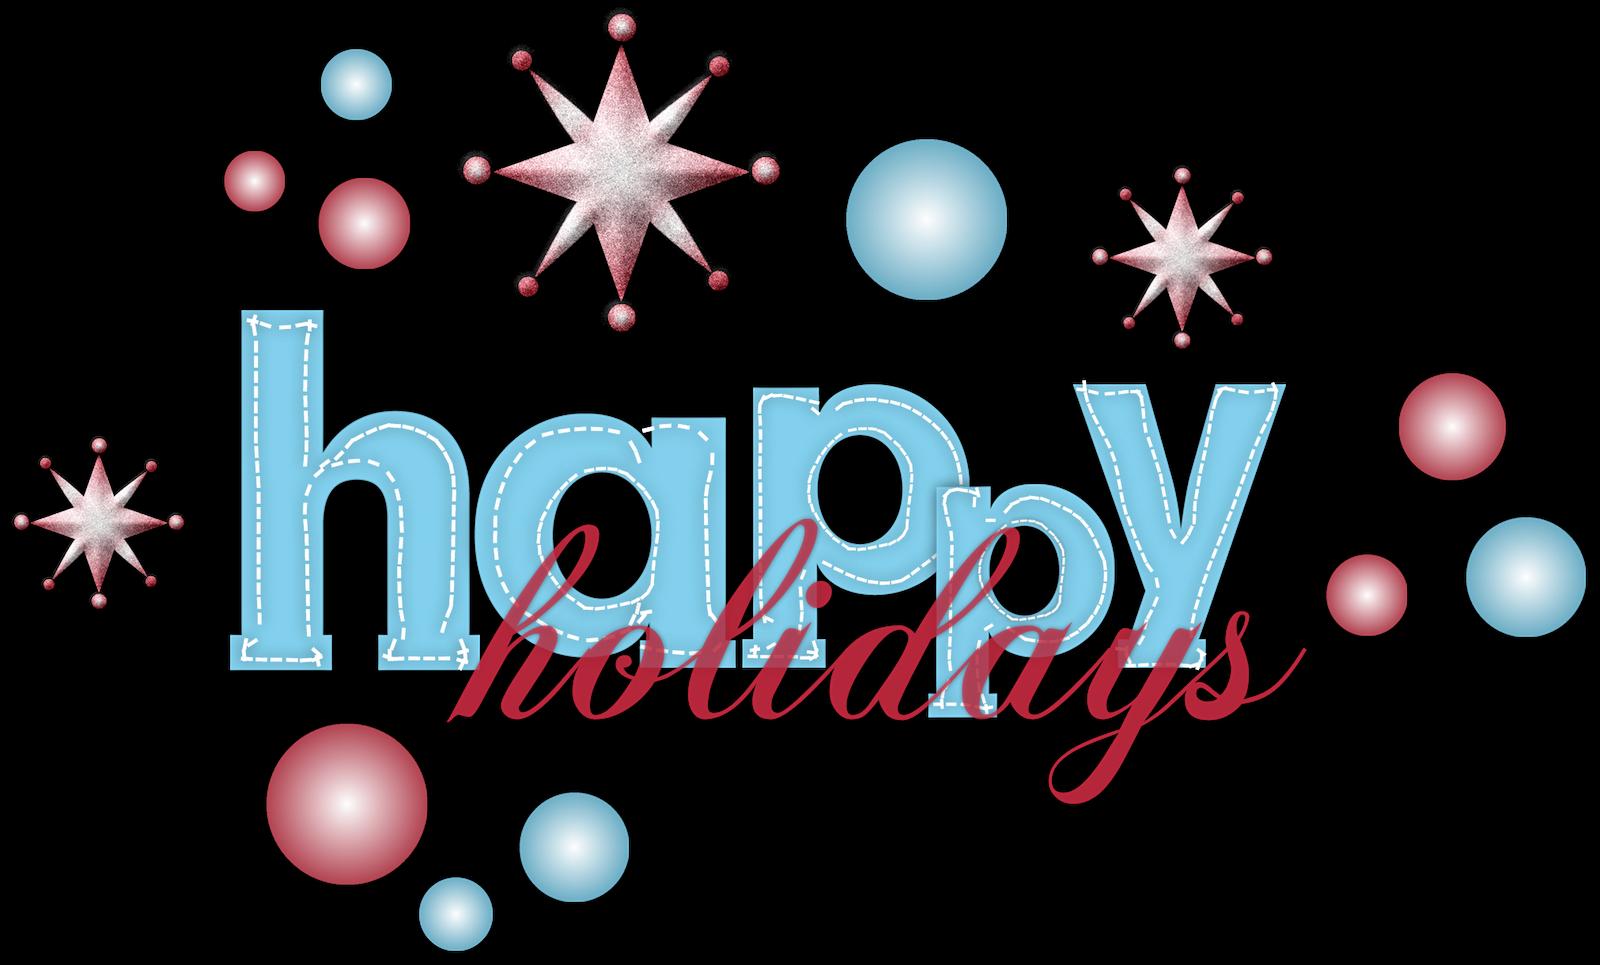 Word Art Png Freebies Enjoy Some Holiday Word Art And A Puffy Felt Snowflake Holiday Holiday Blues Holiday Menus